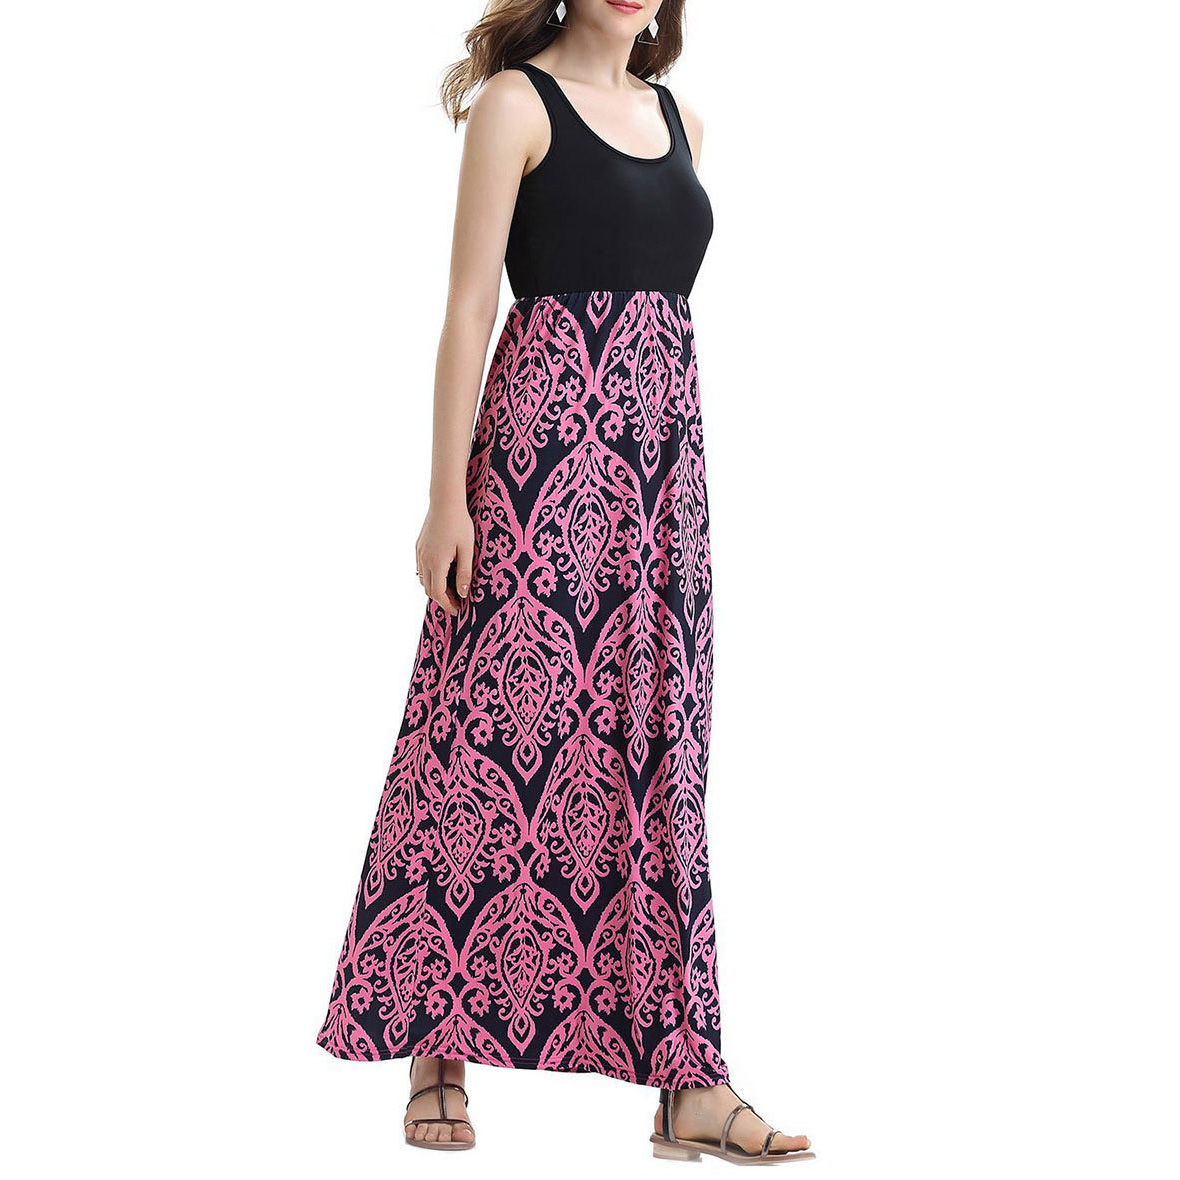 Women Summer Beach Boho Maxi Dress 2018 High Quality Brand Striped Print Long Dresses Feminine Plus Size Loose Casual Dress